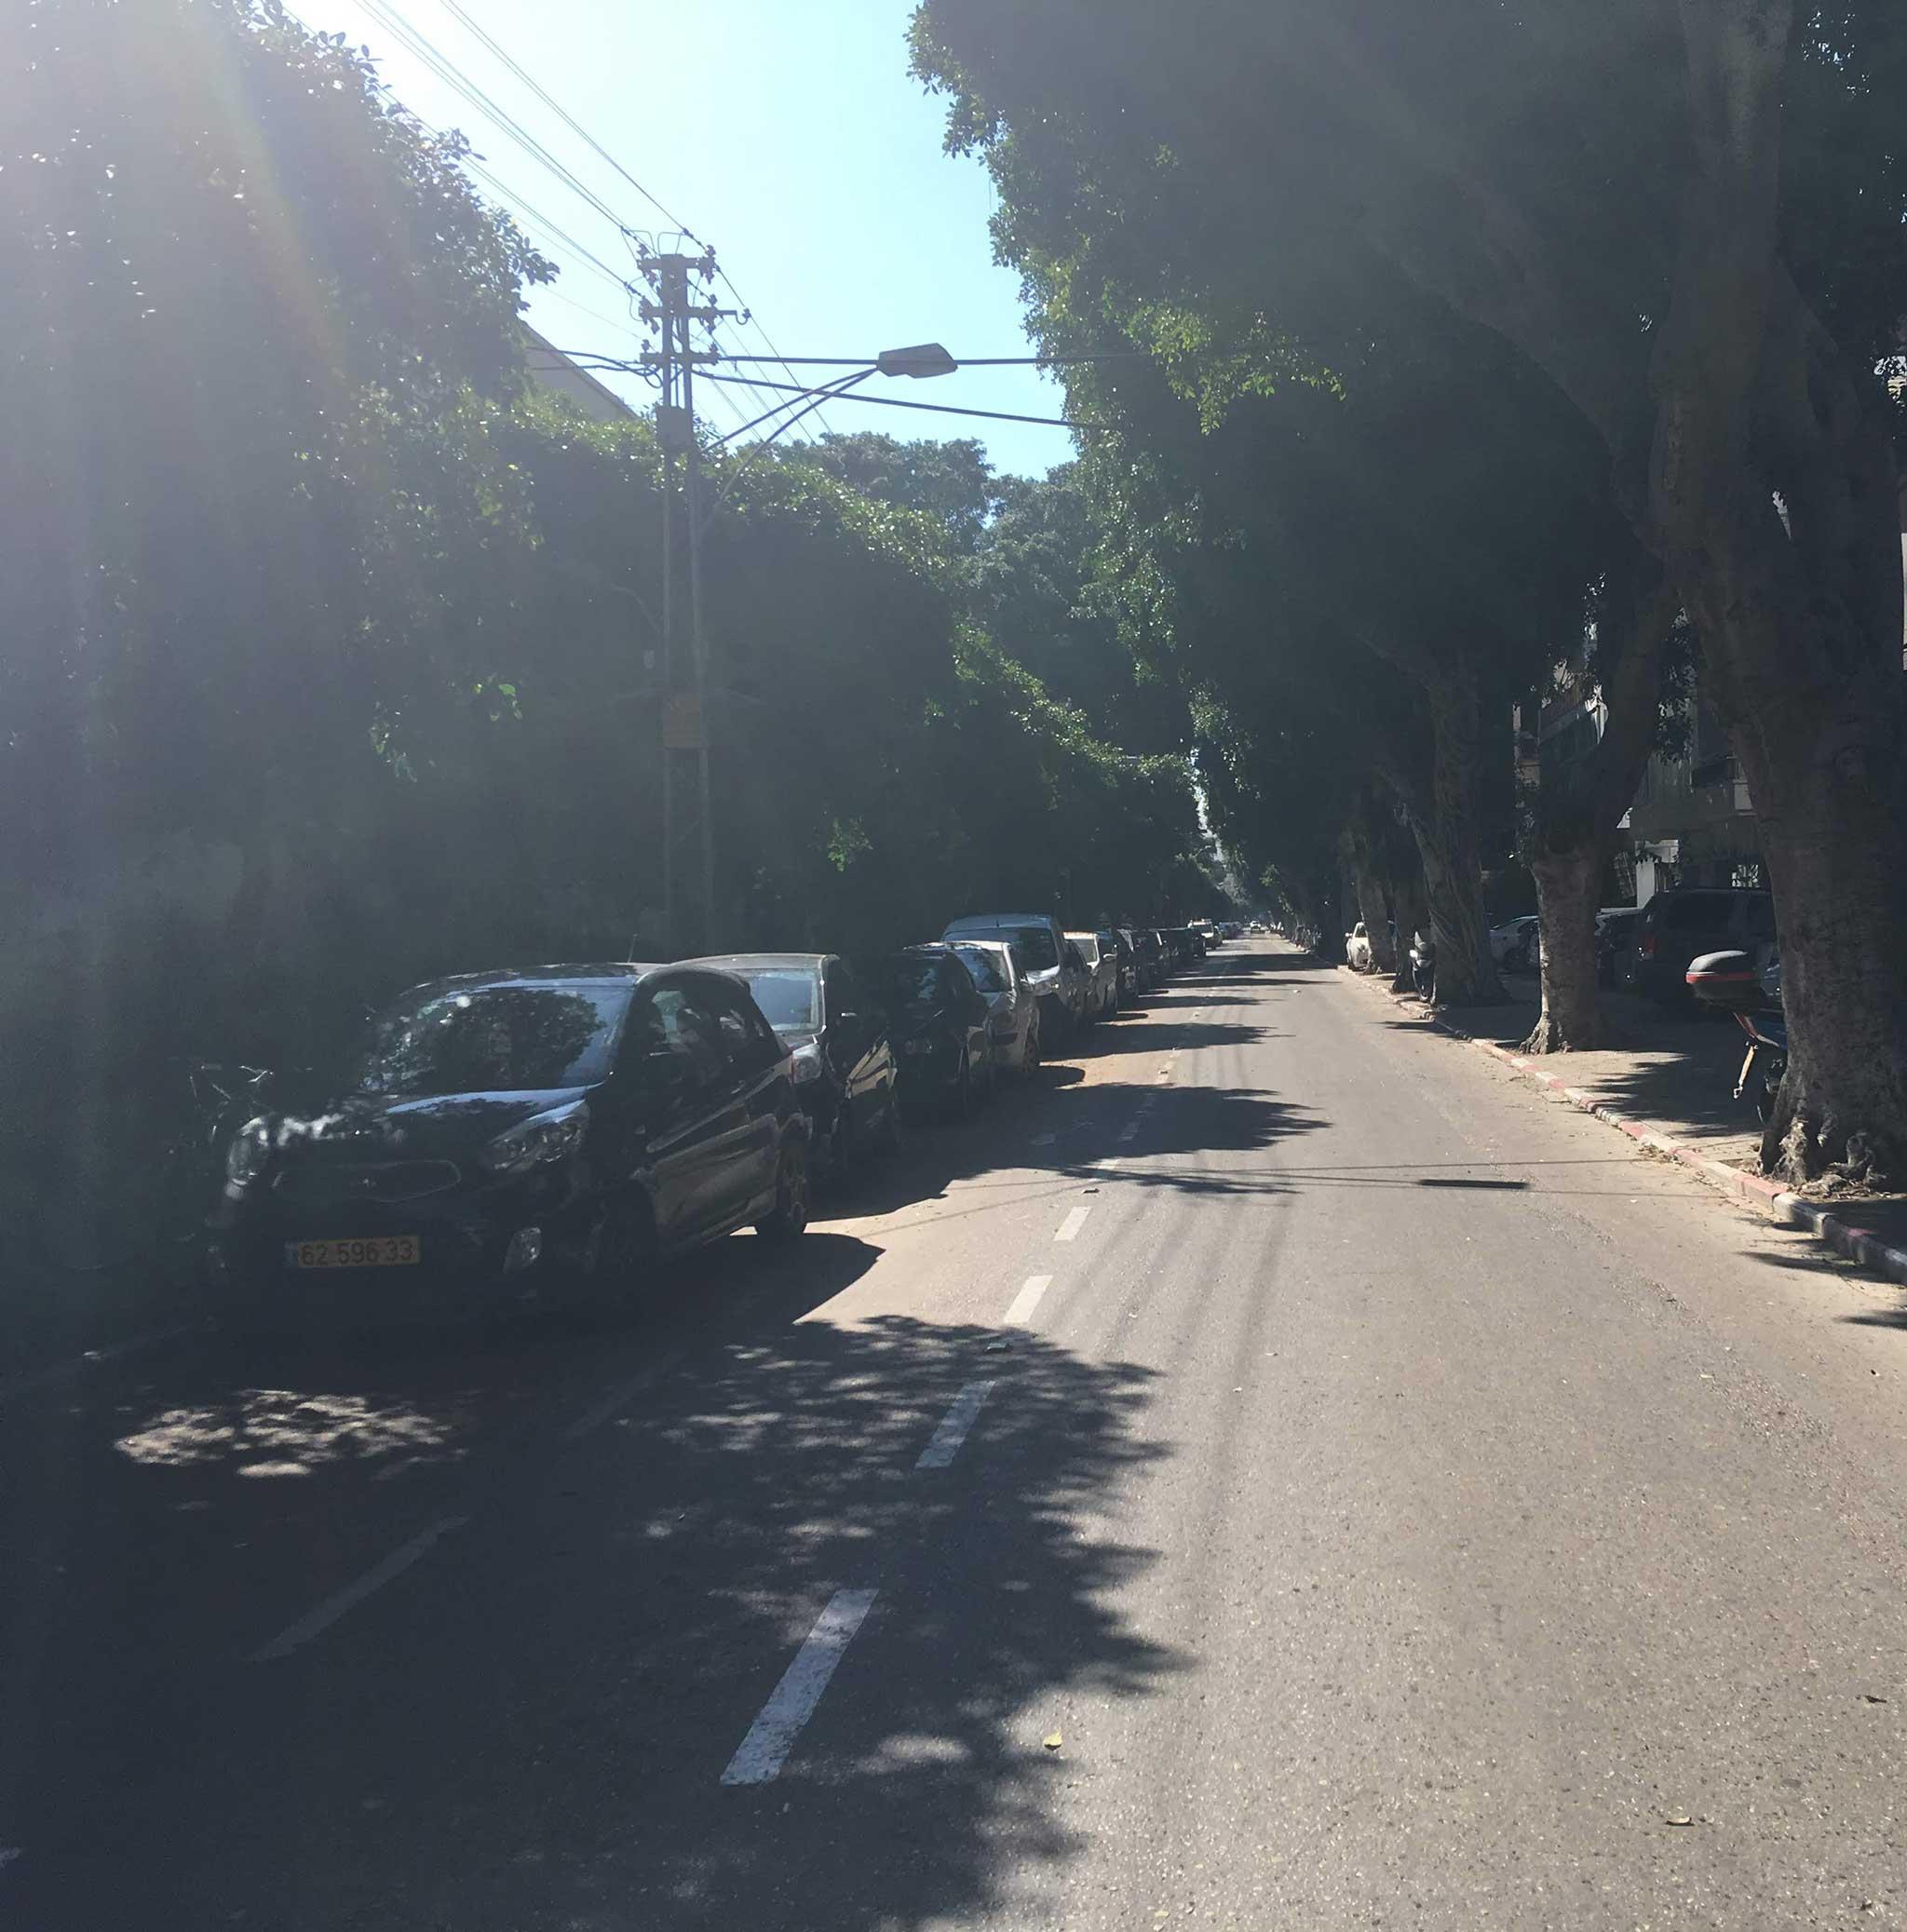 Reines Street on Tel Aviv audio tour The White City